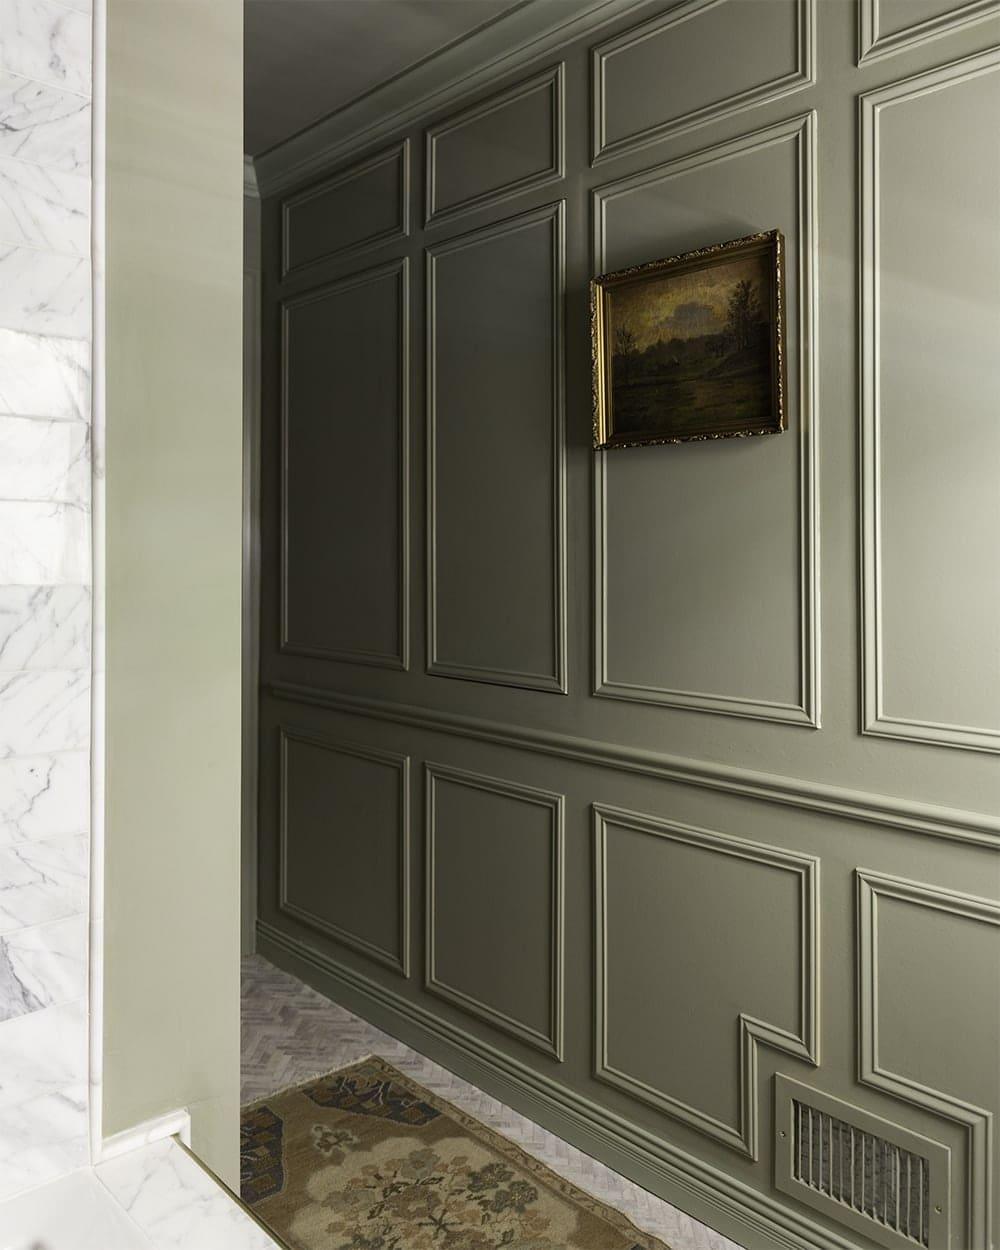 wall-molding-trim-crown-farrow-ball-walls